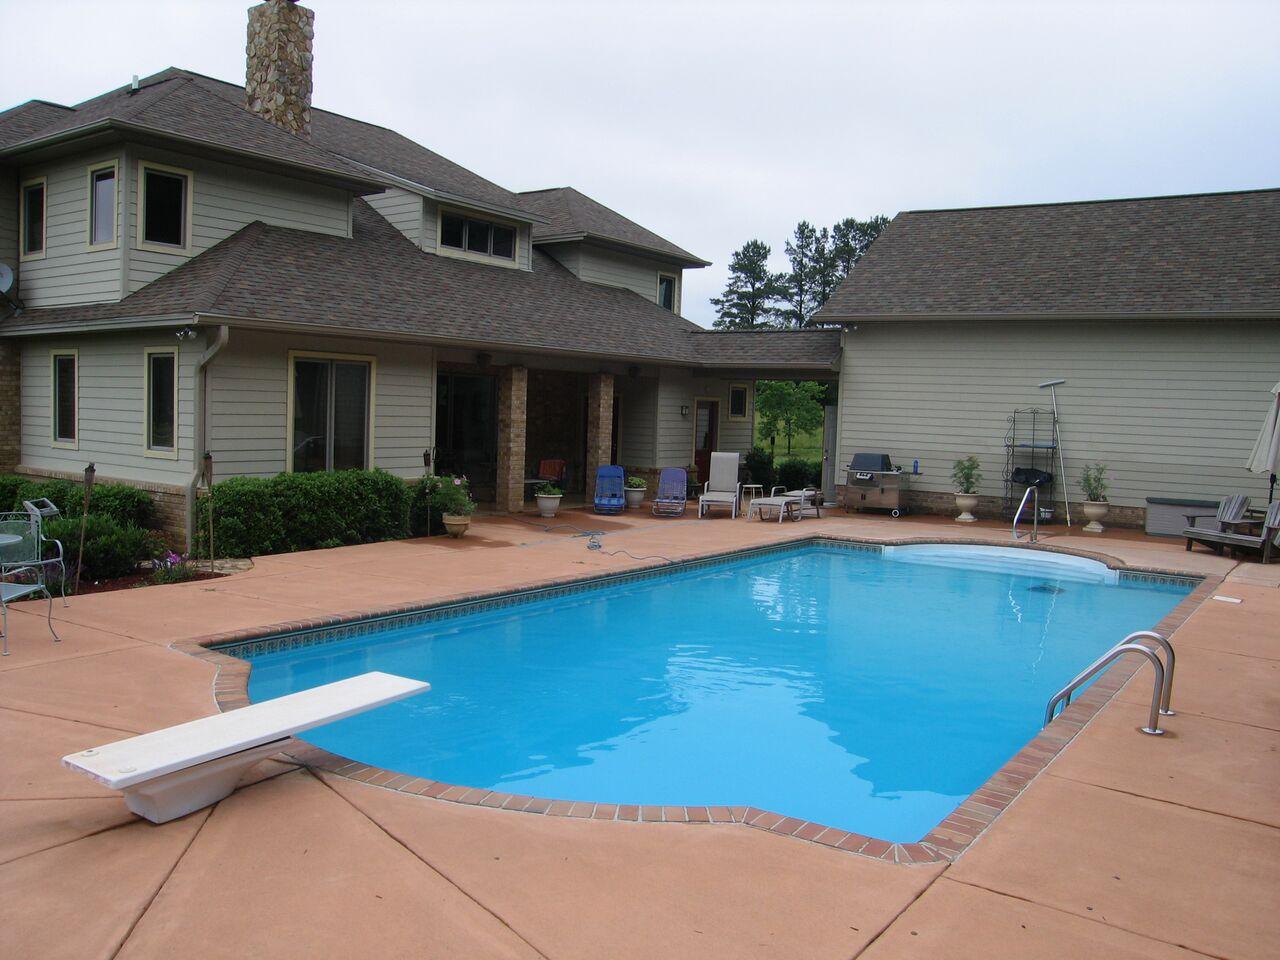 indoor pool house with diving board. VP11 Indoor Pool House With Diving Board